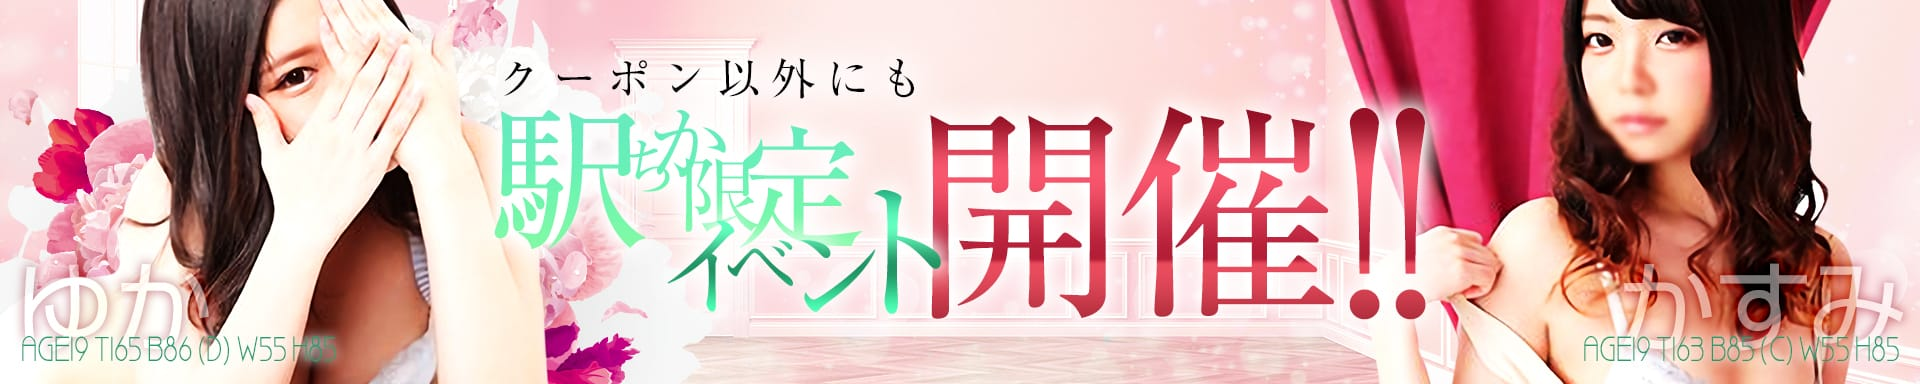 Princess Selection~プリンセスセレクション~金沢店 その3